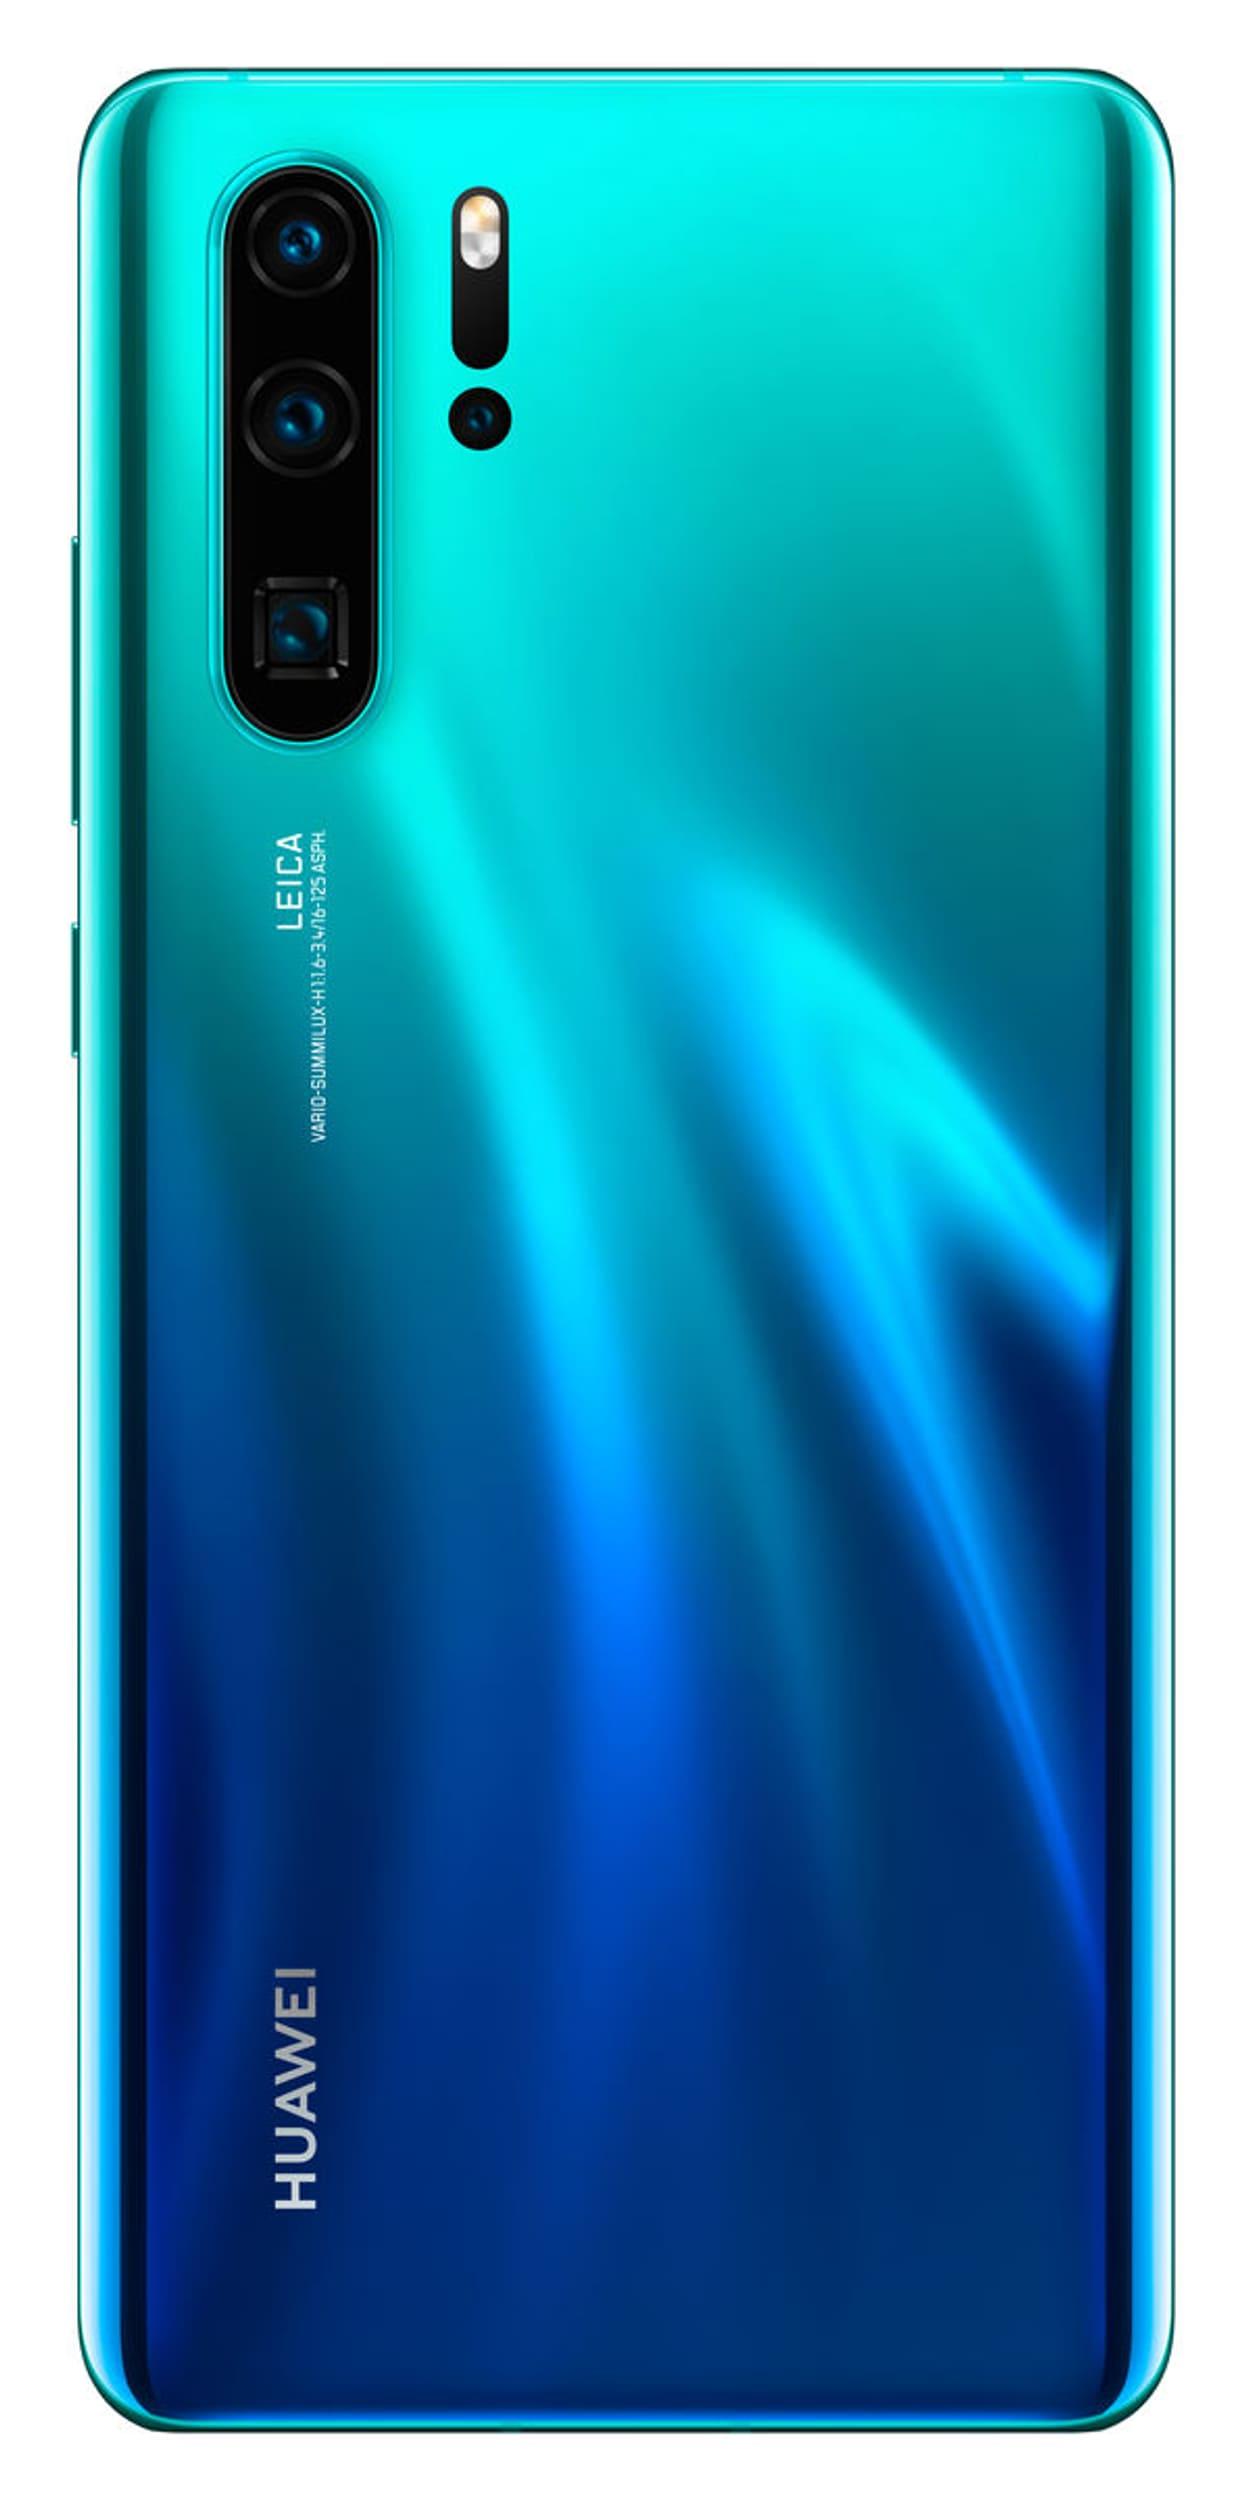 Huawei P30 Pro 128GB Dual SIM A. Blue